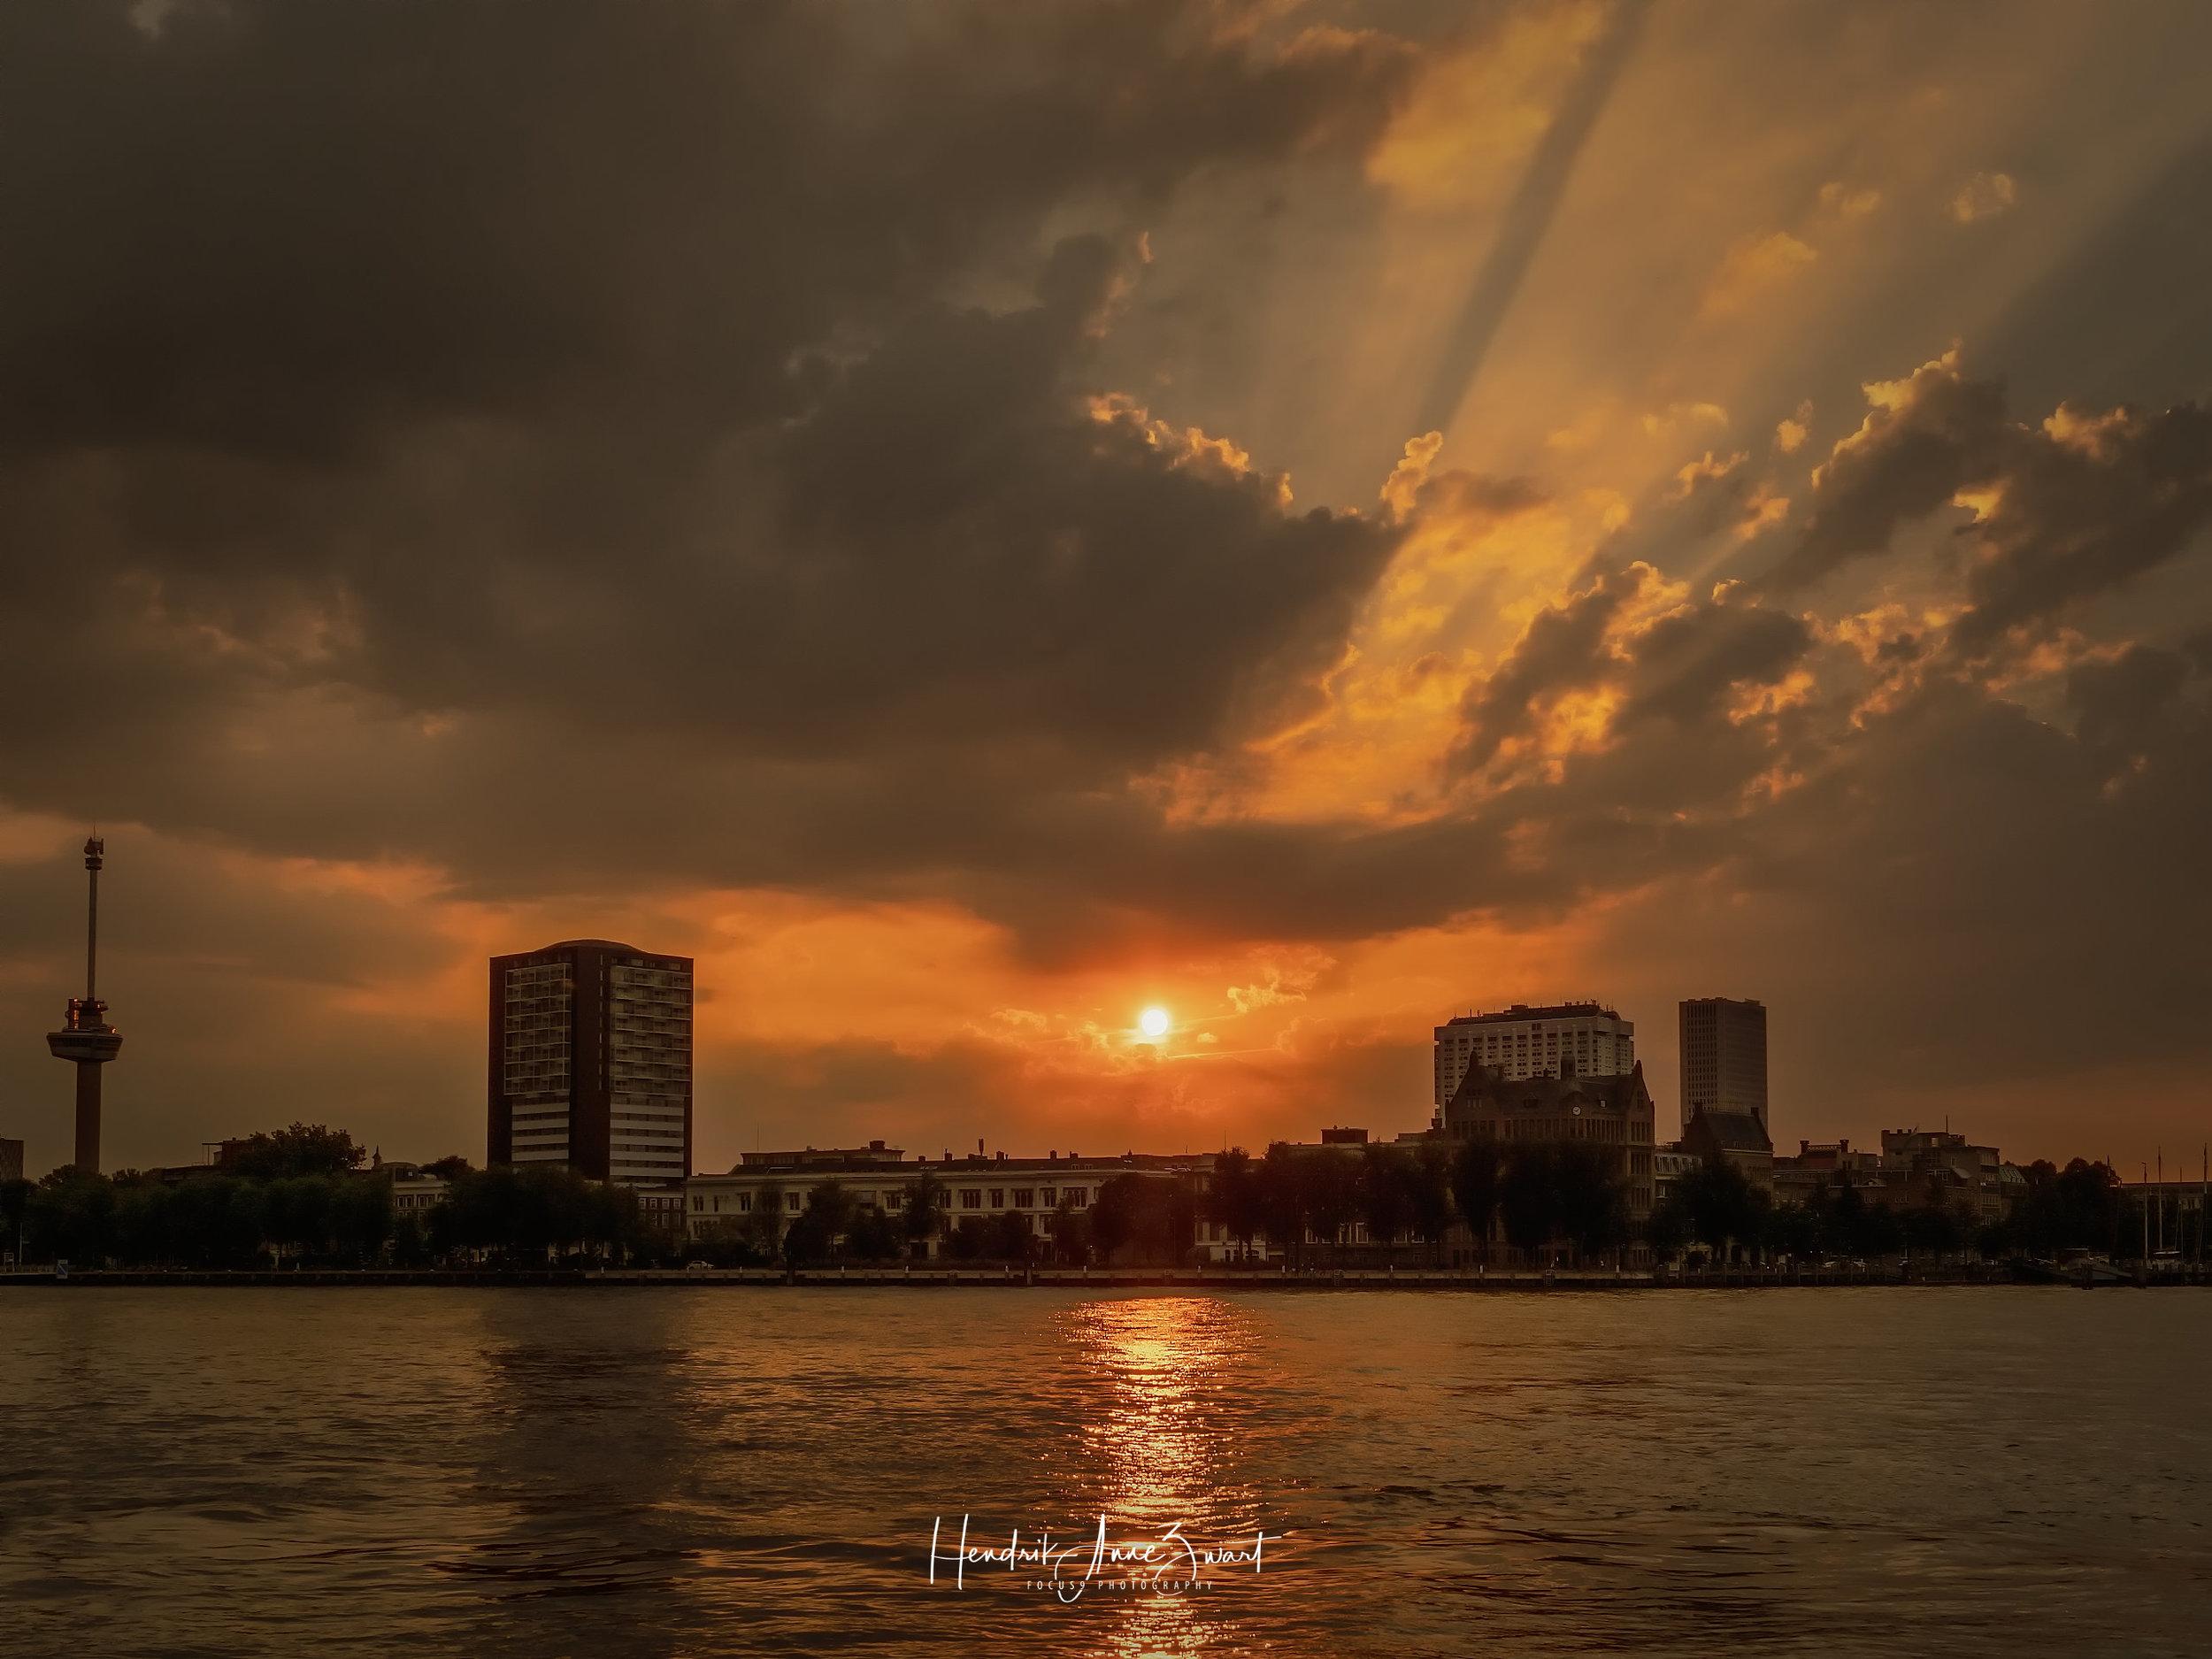 Rotterdam_Maas_Sunset_4.jpg